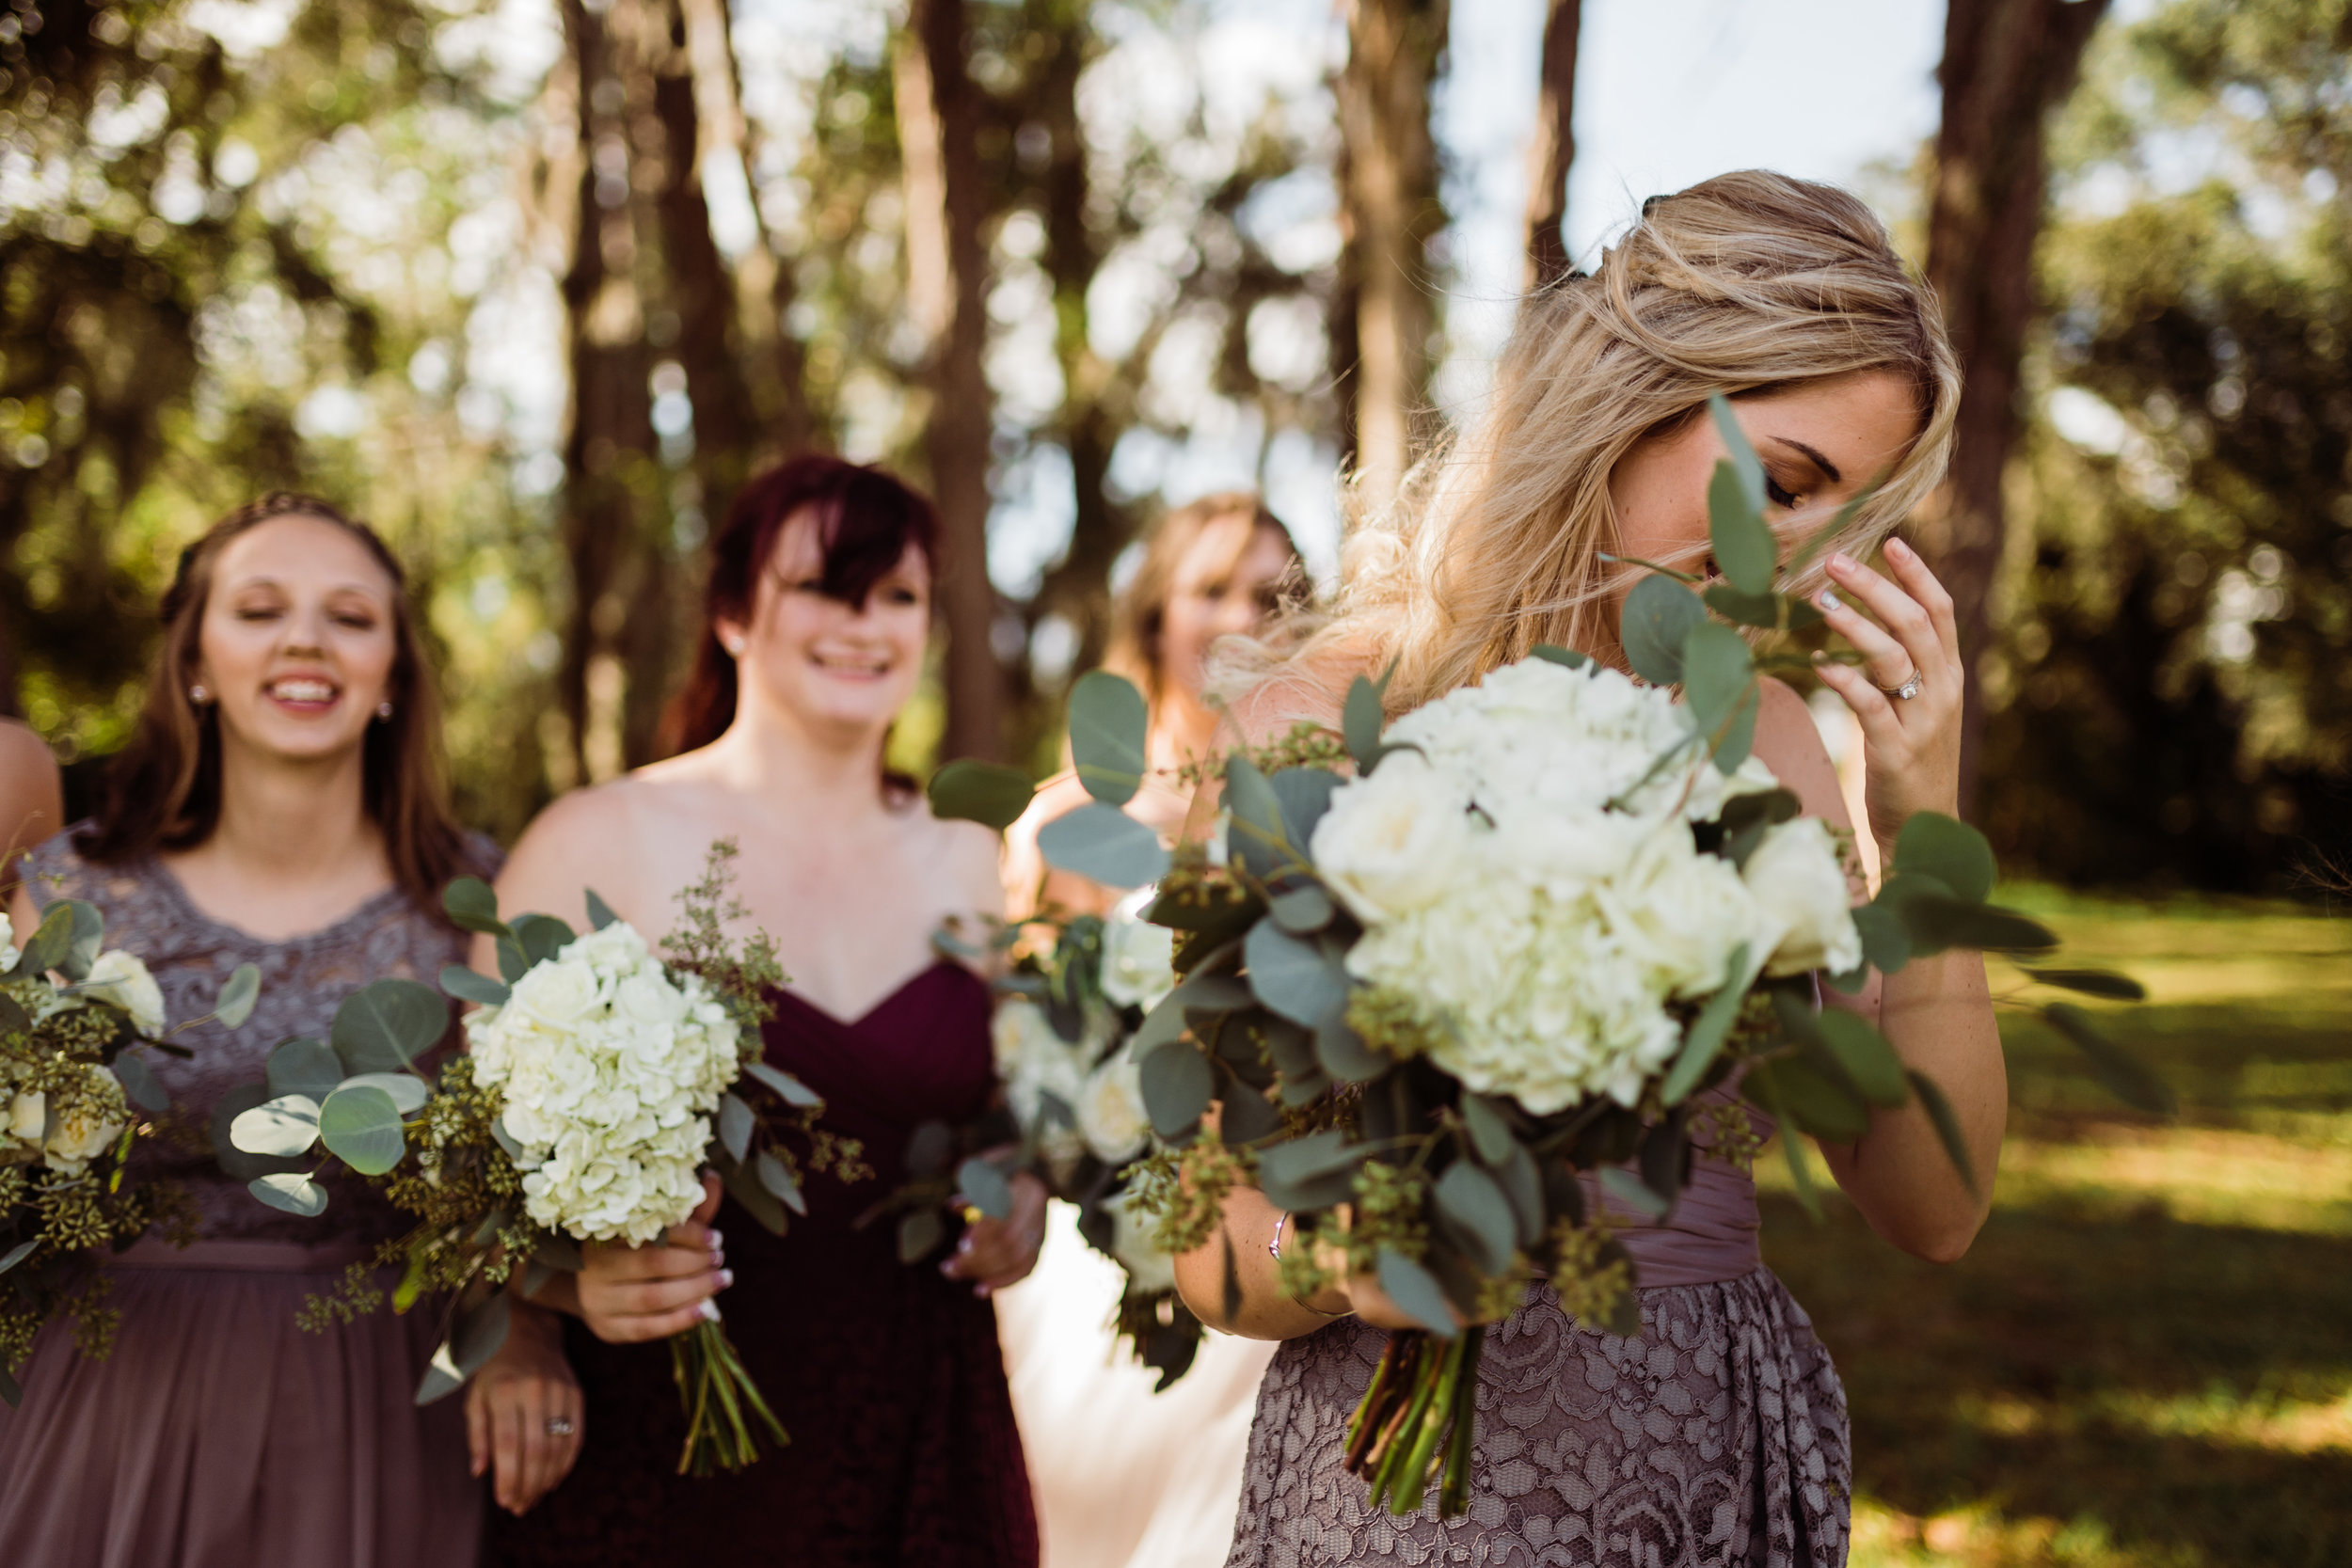 2017.10.14 Samantha and Matthew Crabtree Sarasota Wedding (283 of 708).jpg